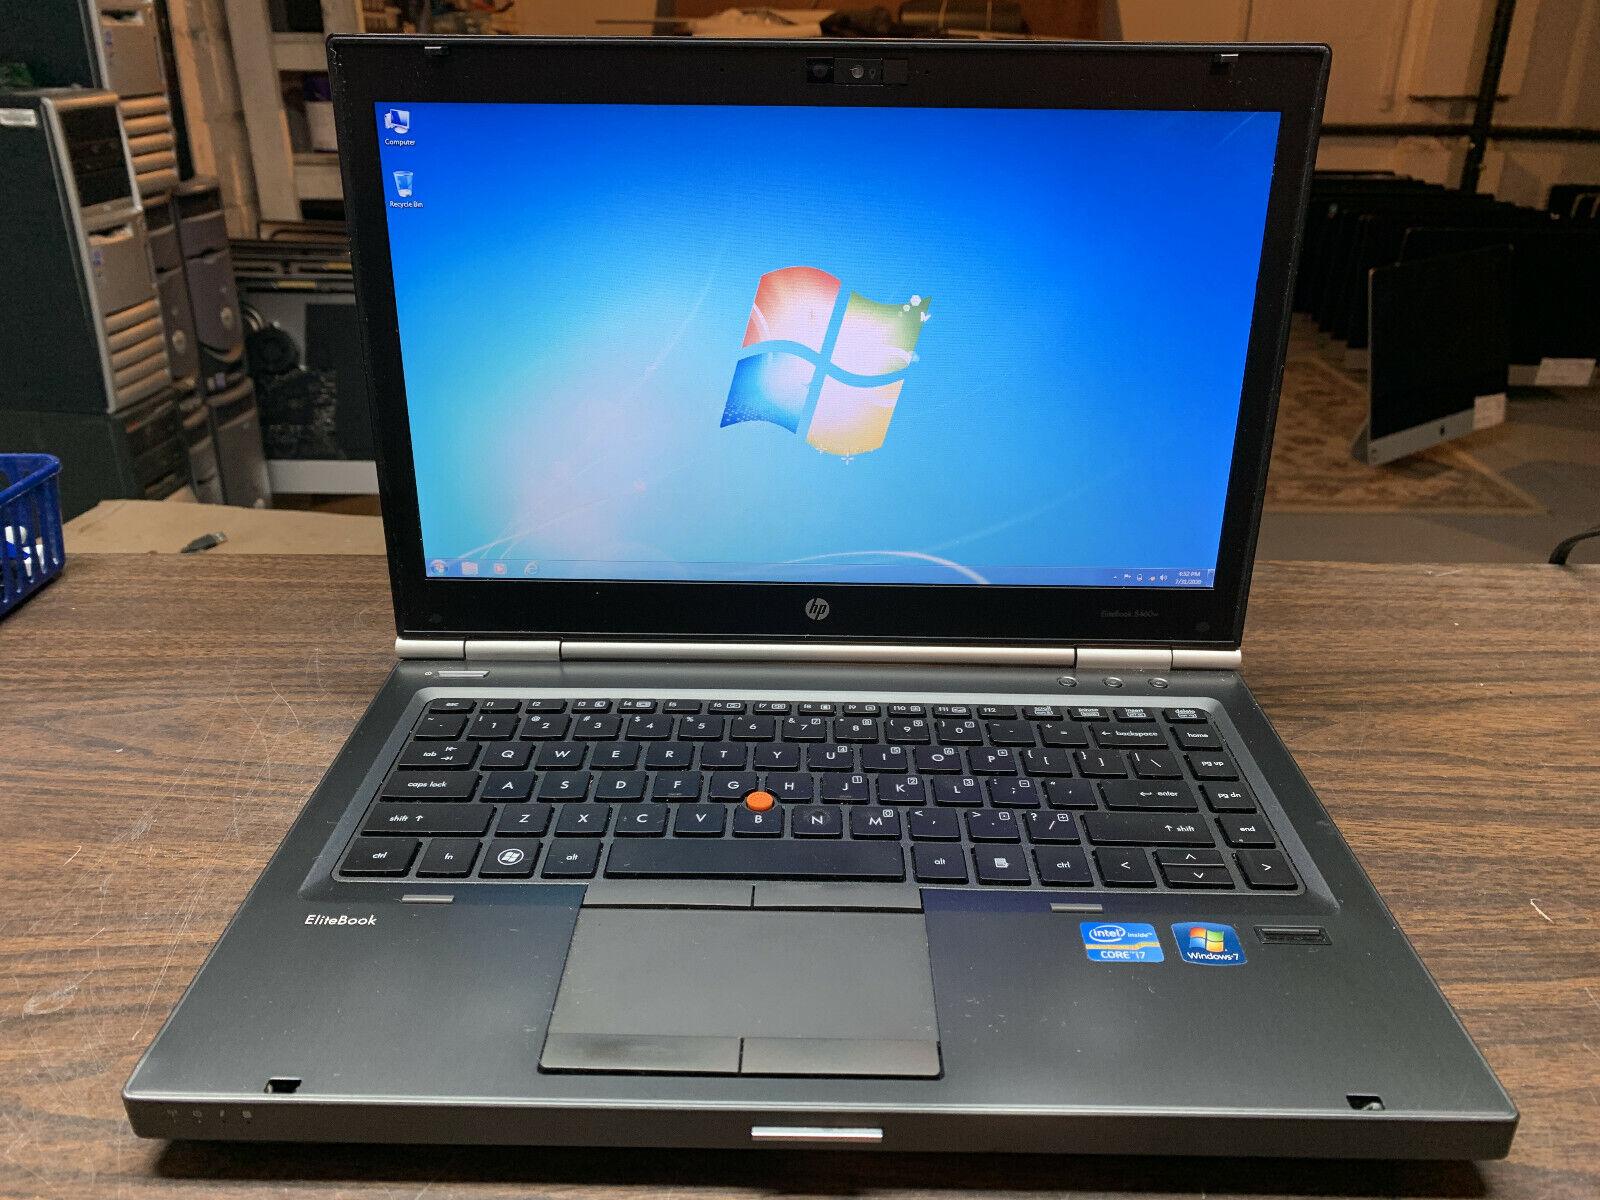 "Laptop Windows - HP EliteBook 8460w 14"" Laptop - Intel Core i7, 500GB HDD, 8GB RAM, Windows 7 Pro"